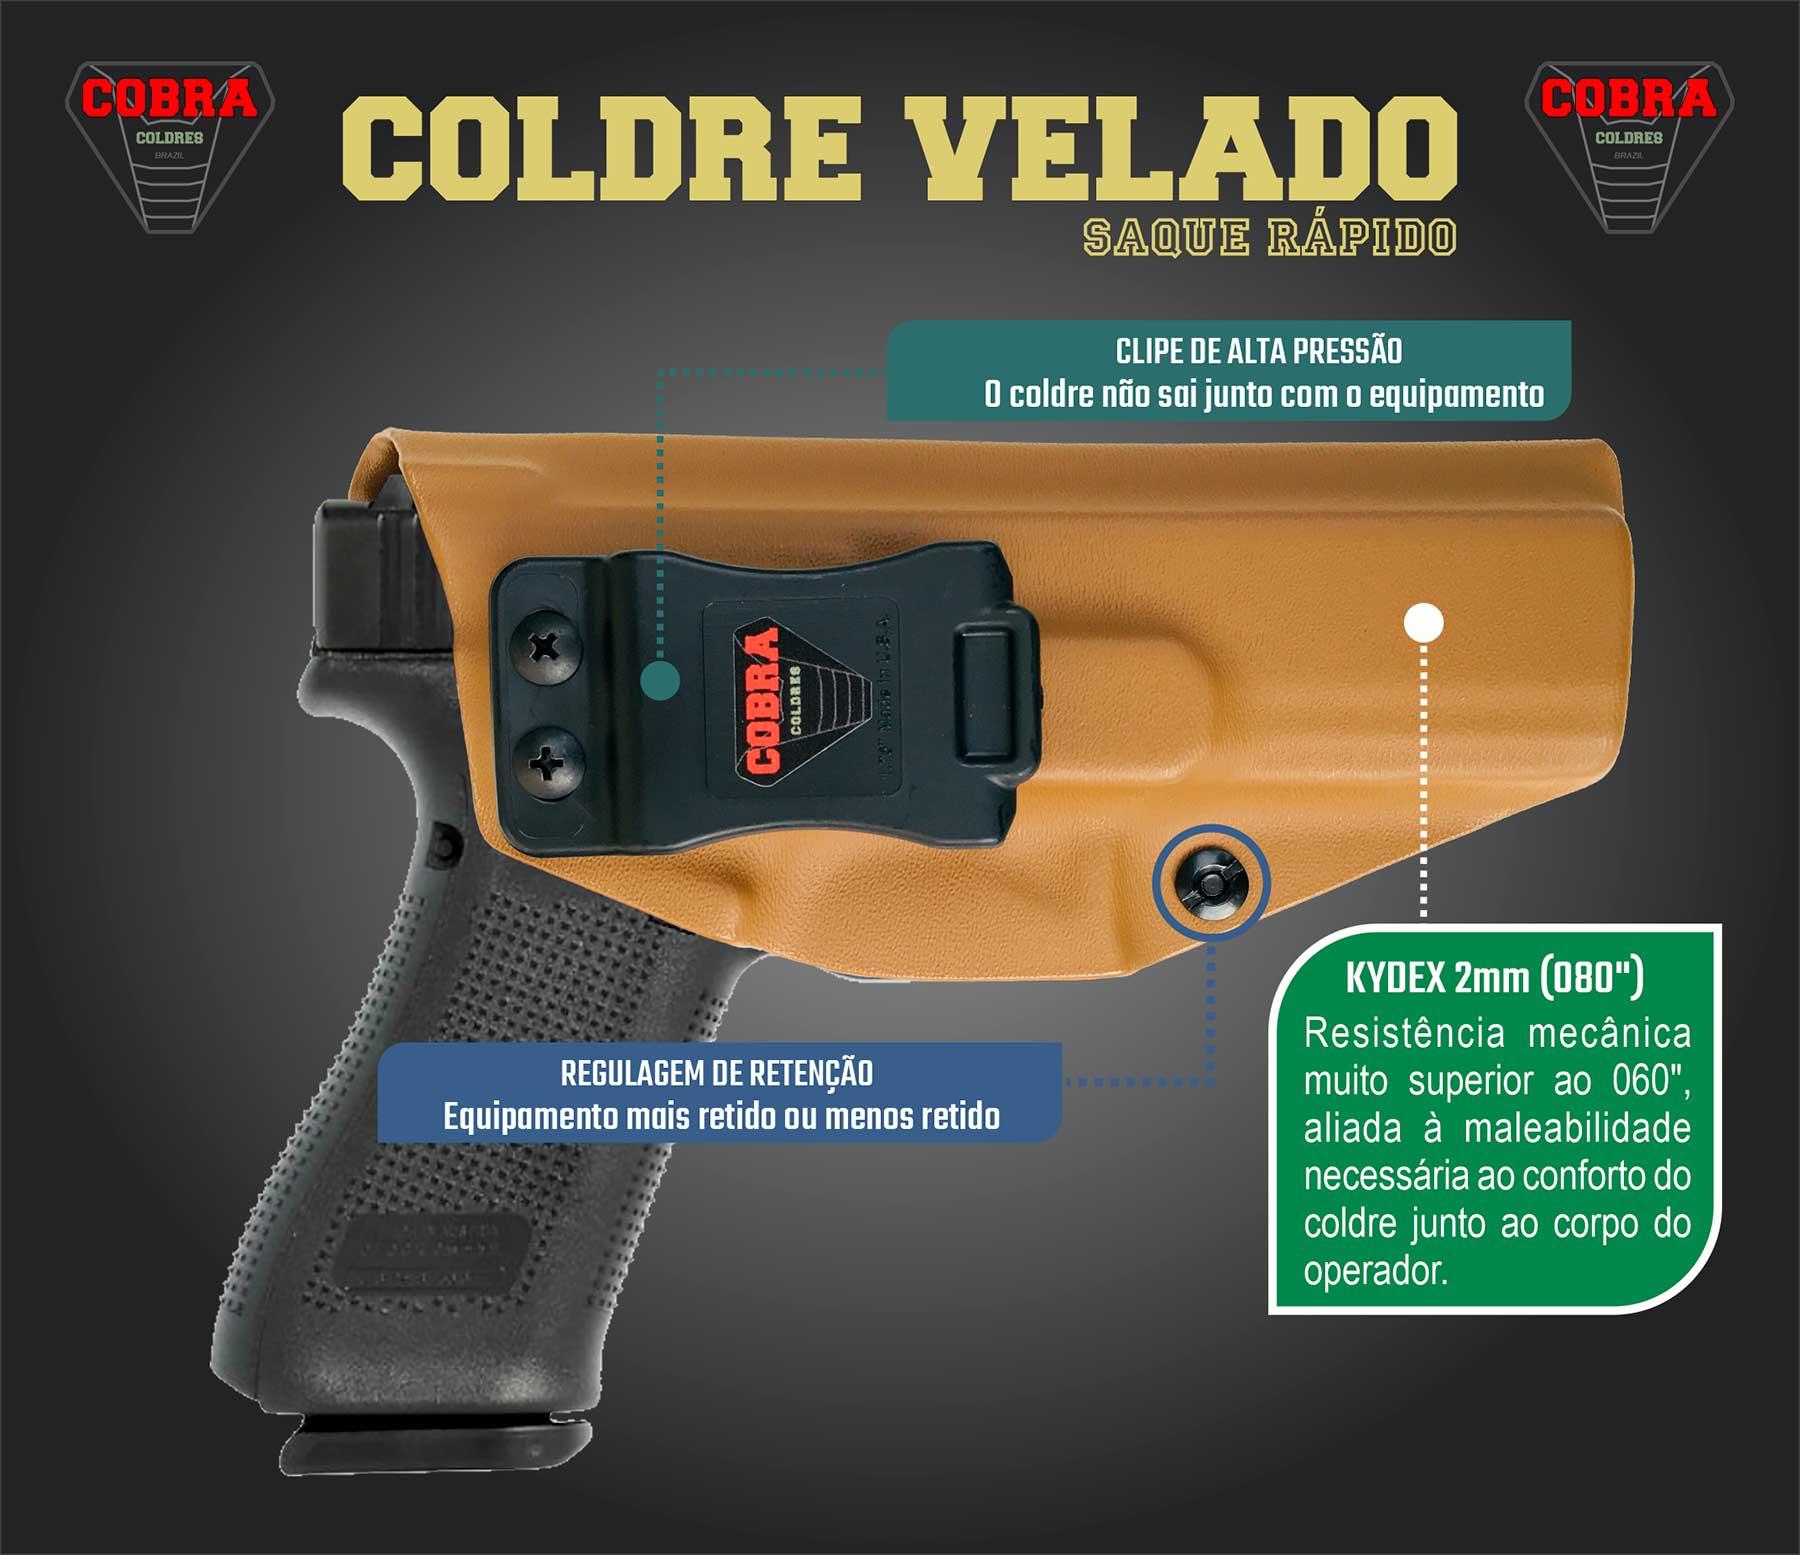 Coldre  [Arex] [Delta] [9mm] [Rex Delta] Kydex + 1 Porta-Carregador Universal - Saque Rápido Velado Kydex® 080